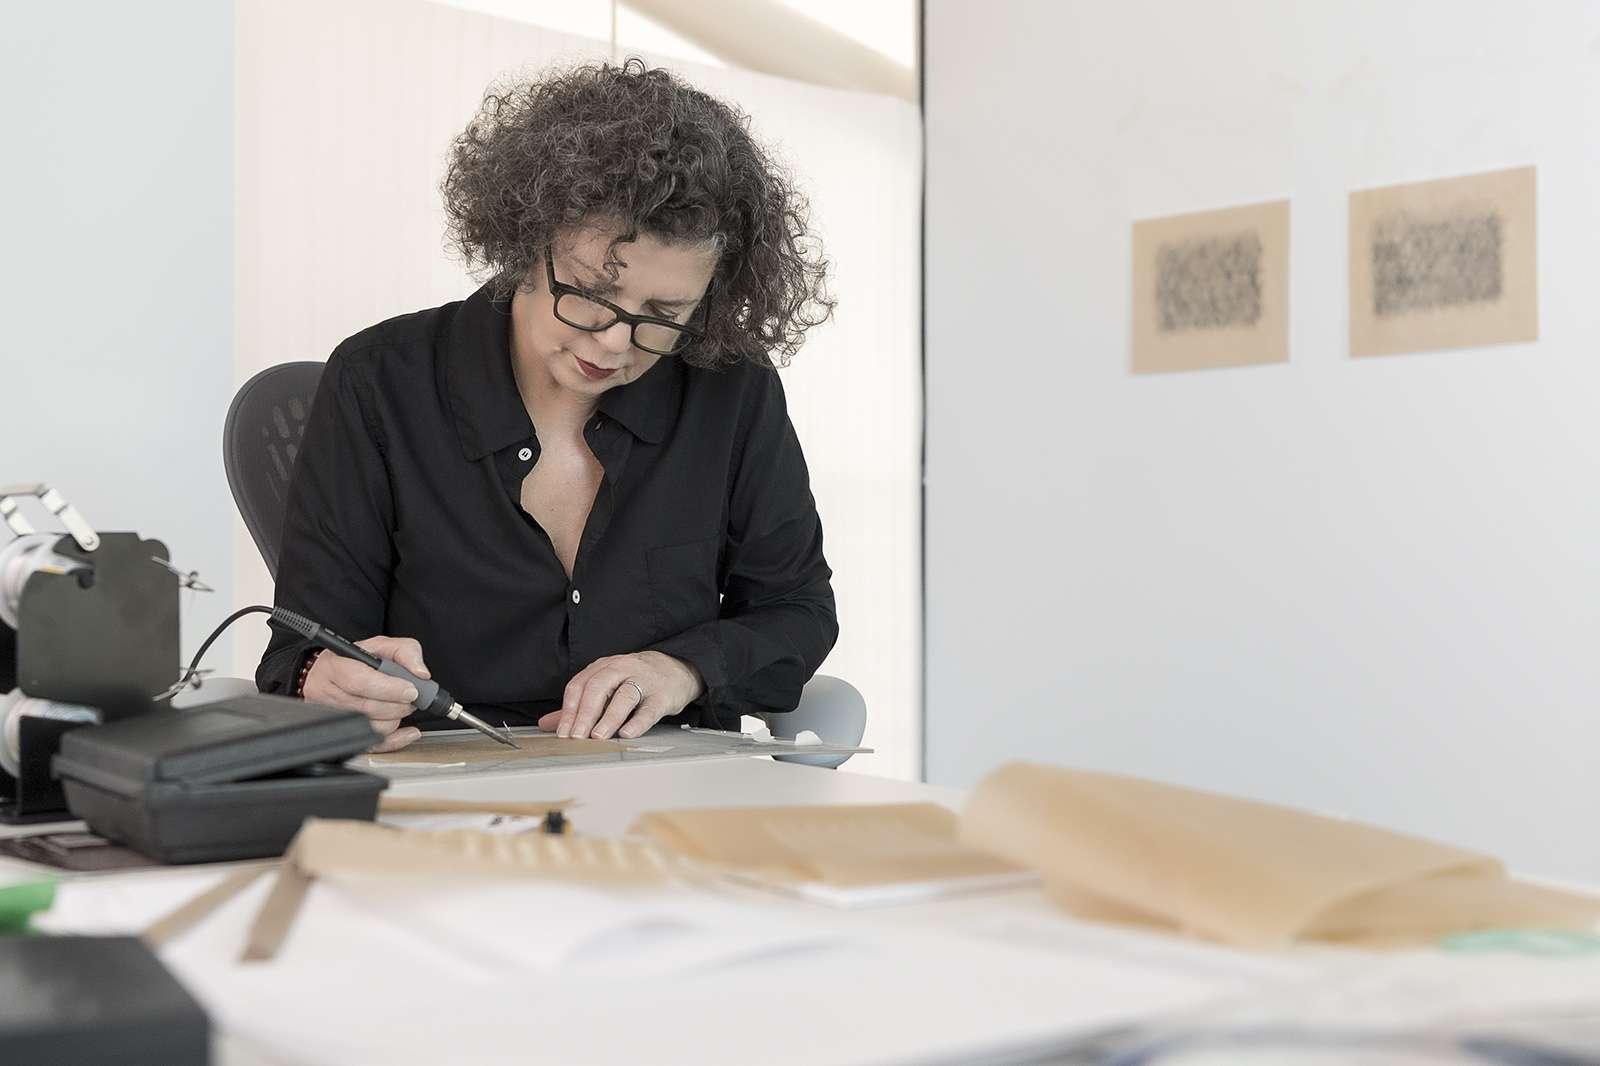 Mona Hatoum at the Moody. Photo: Nash Baker